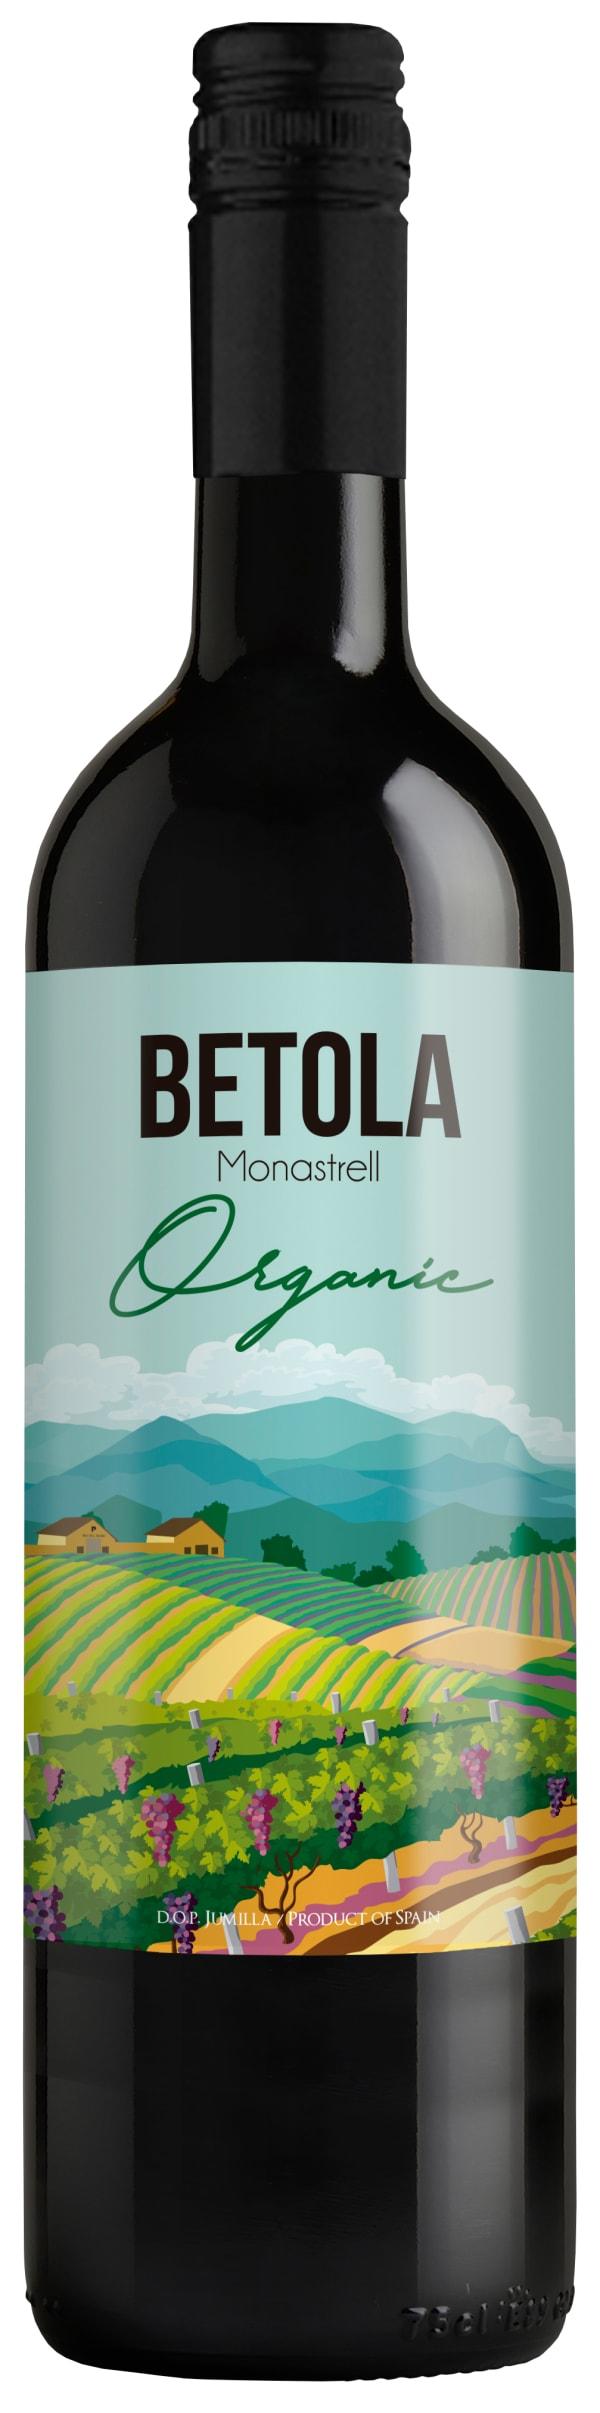 Betola Organic Monastrell 2017